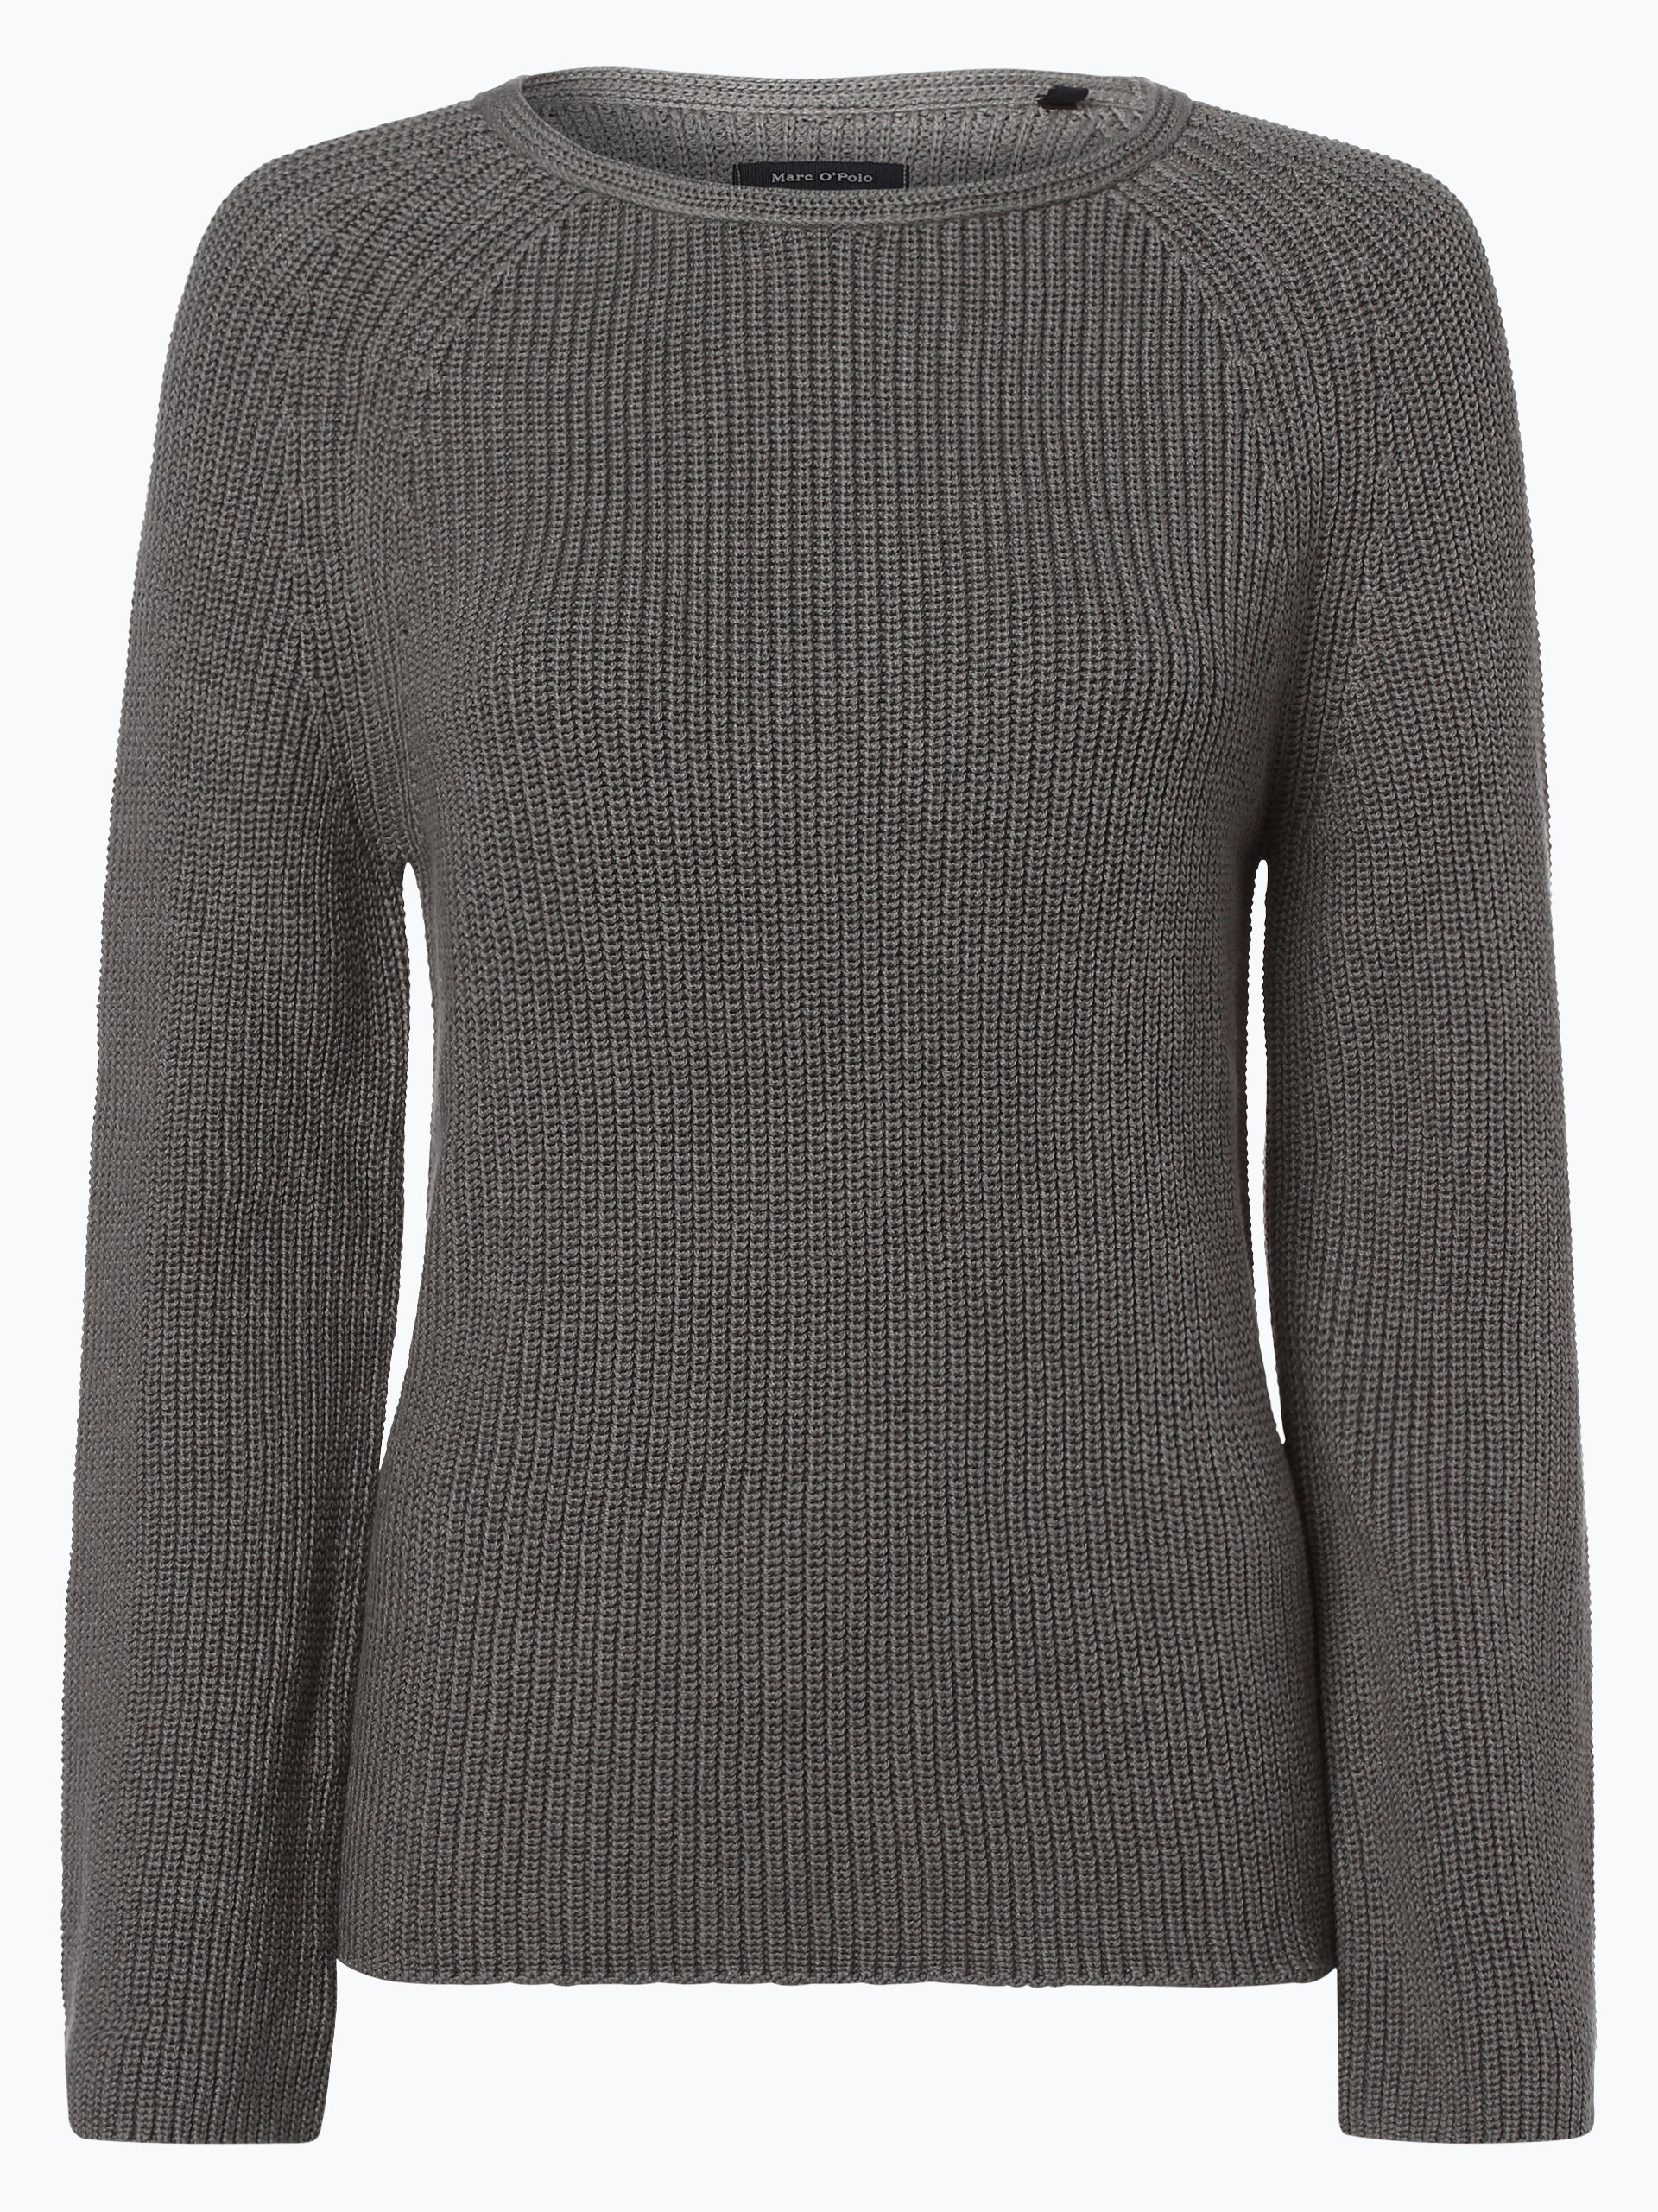 marc o 39 polo damen pullover khaki uni online kaufen vangraaf com. Black Bedroom Furniture Sets. Home Design Ideas